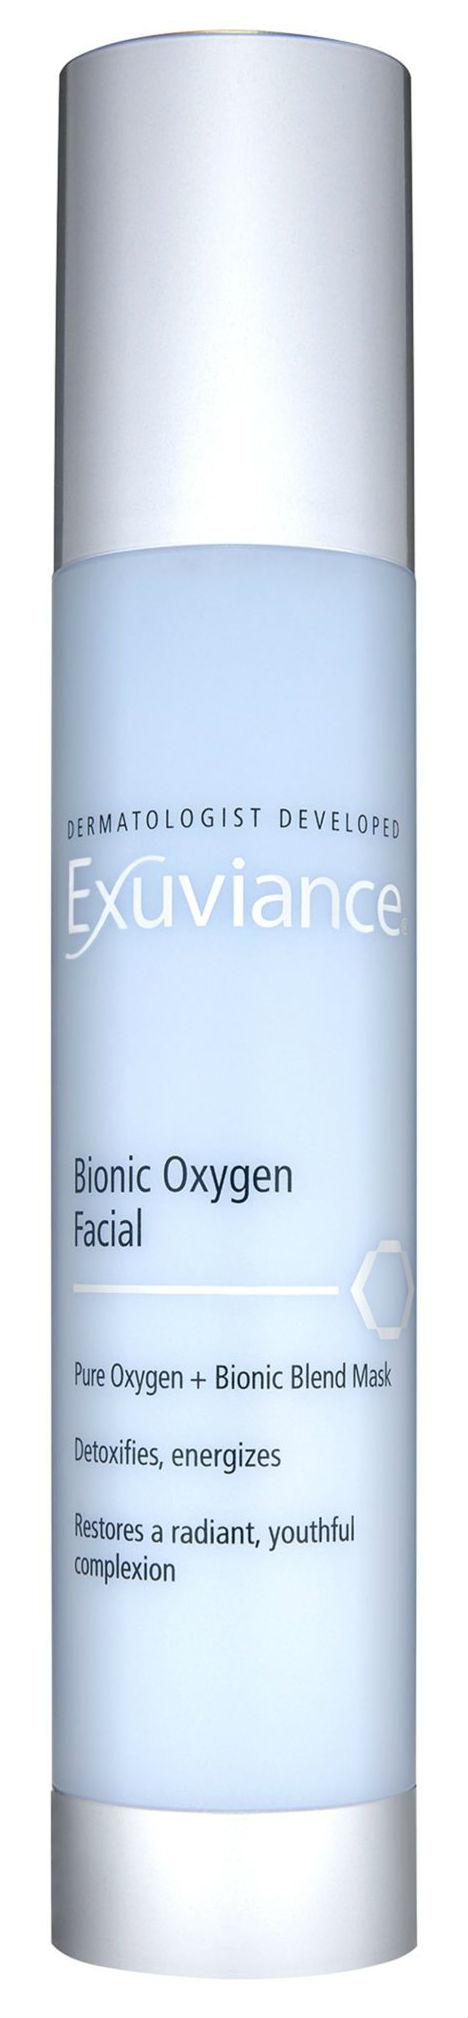 F20103C-BionicOxygenFacial.jpg